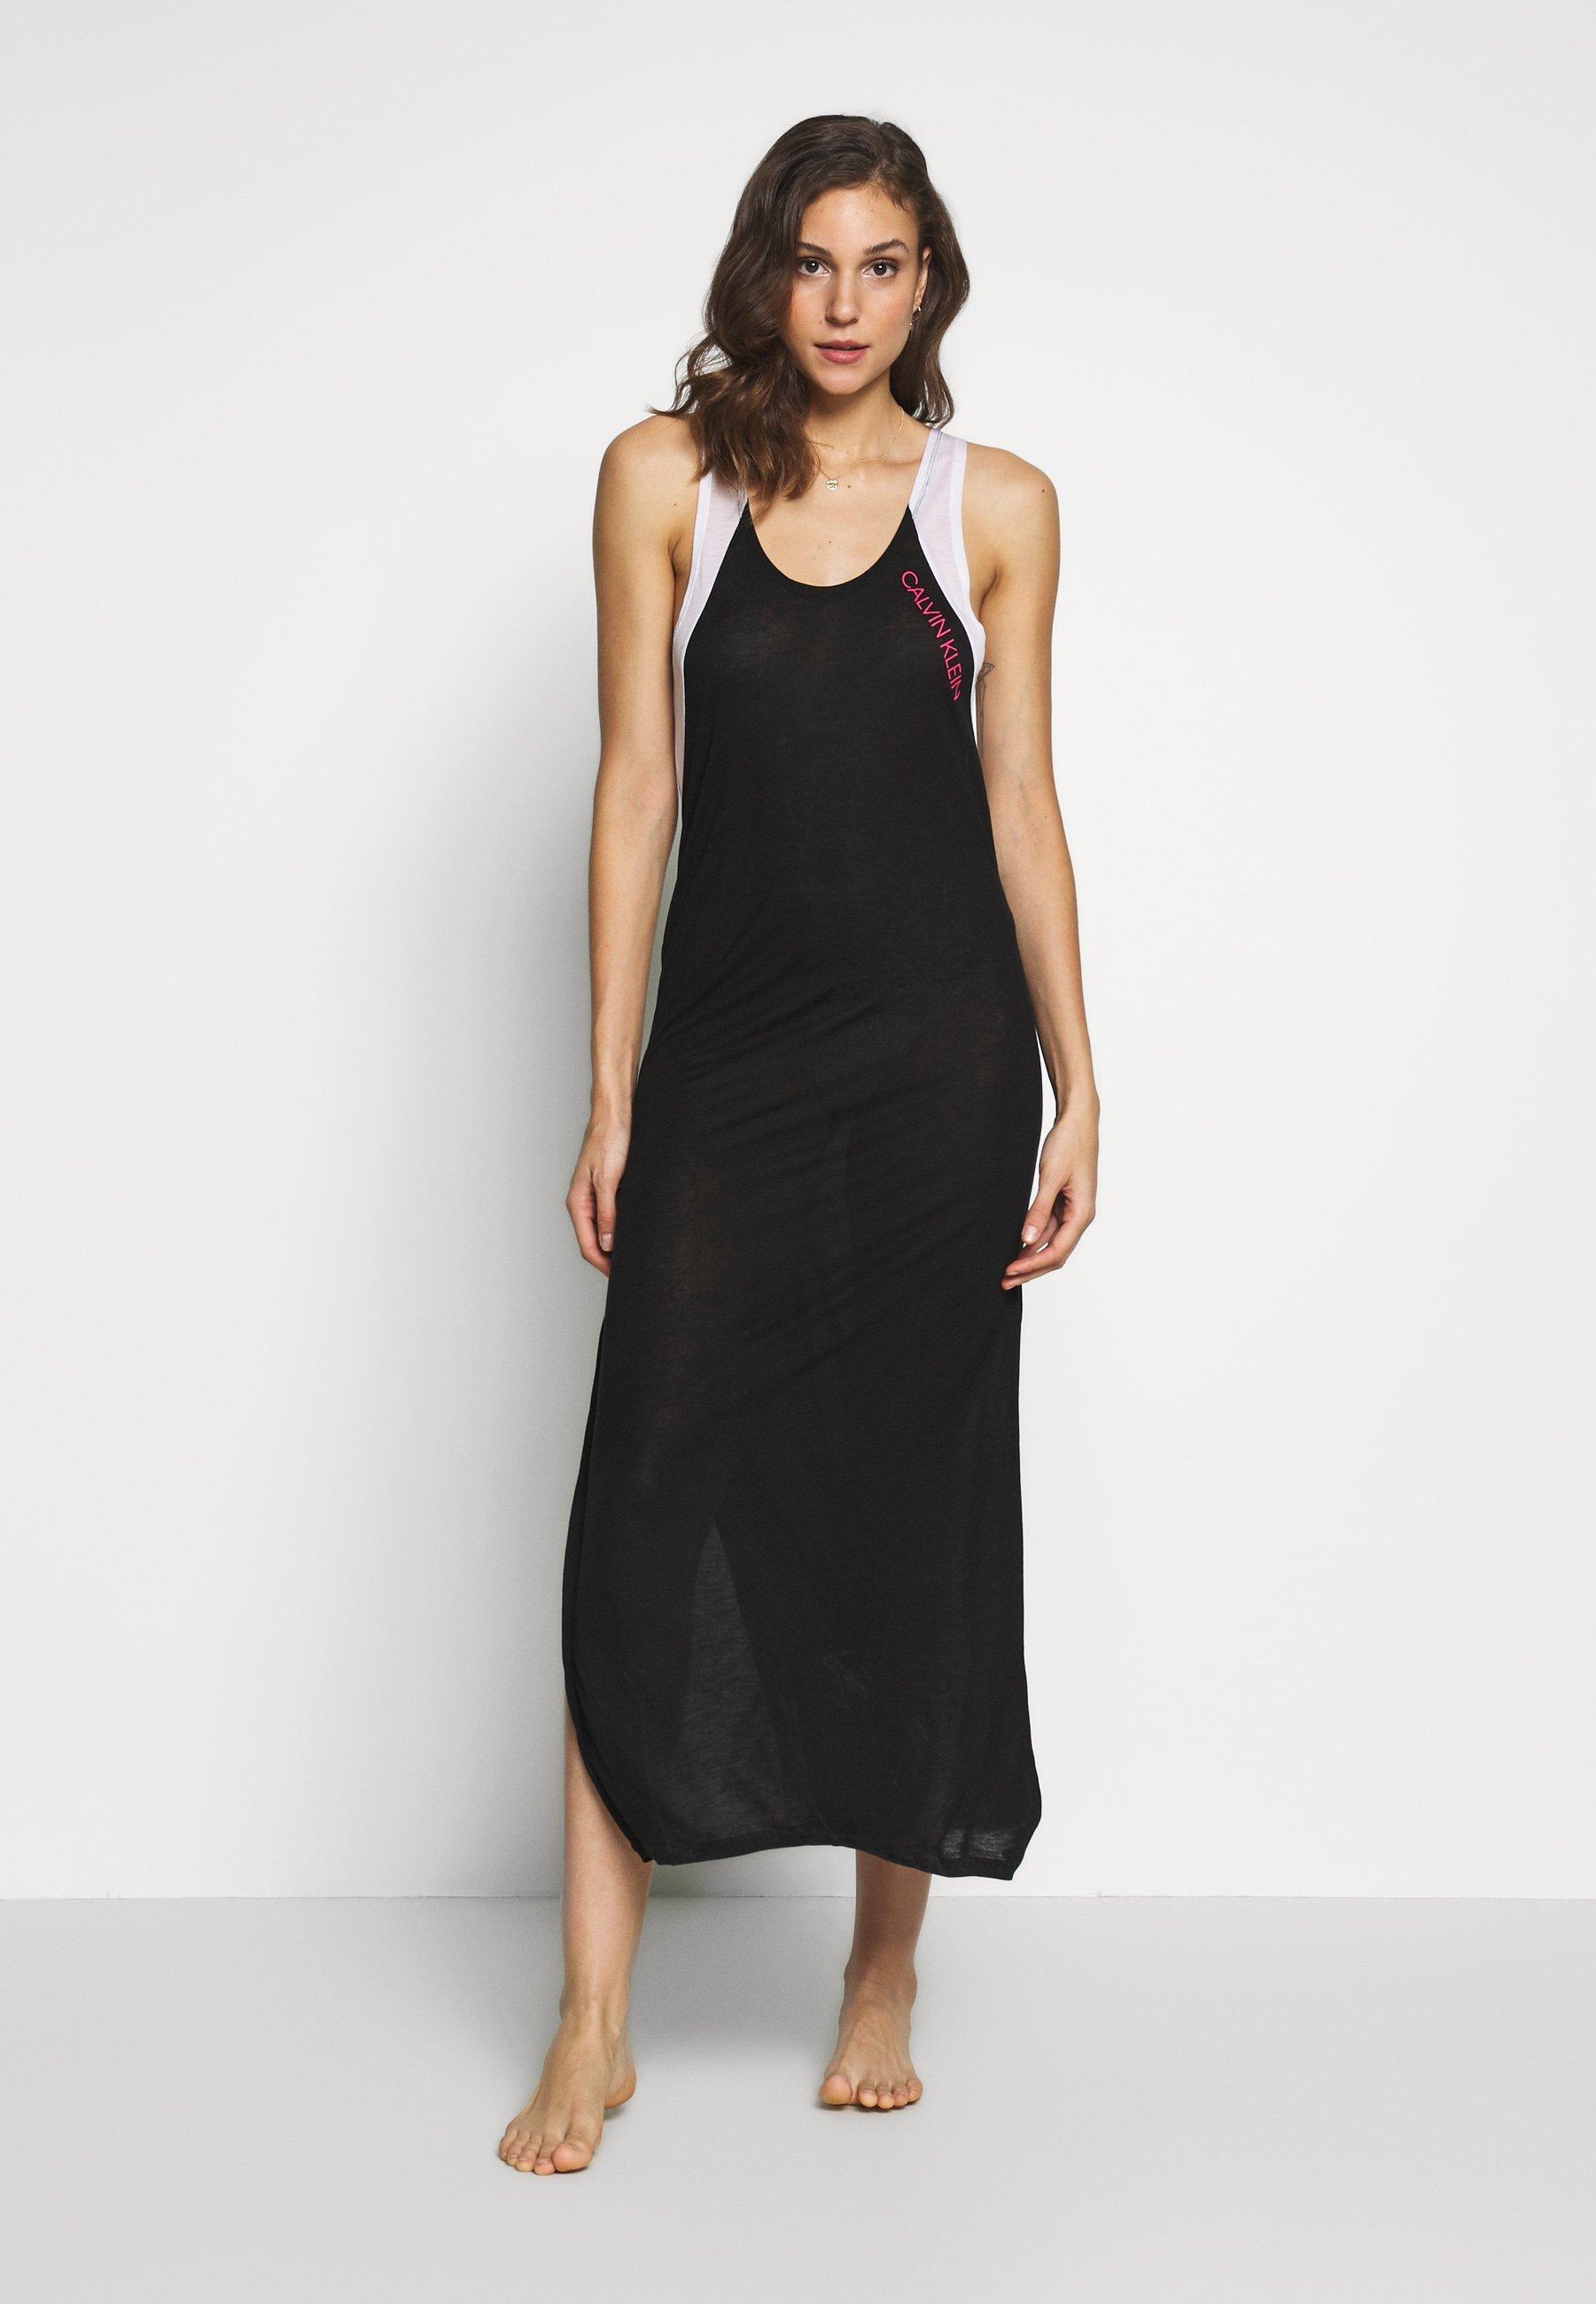 Koszule nocne Calvin Klein w ZALANDO przesyłka gratis  XK550